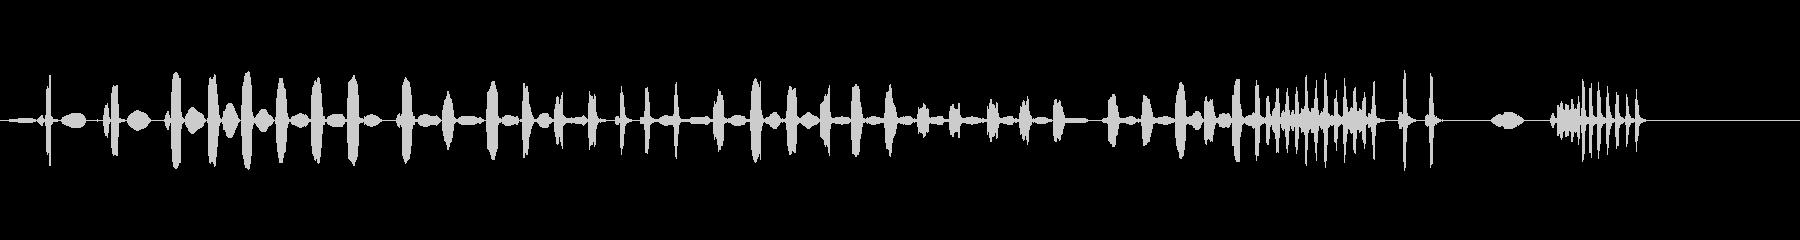 NUTRIA-NUORIA ORI...の未再生の波形